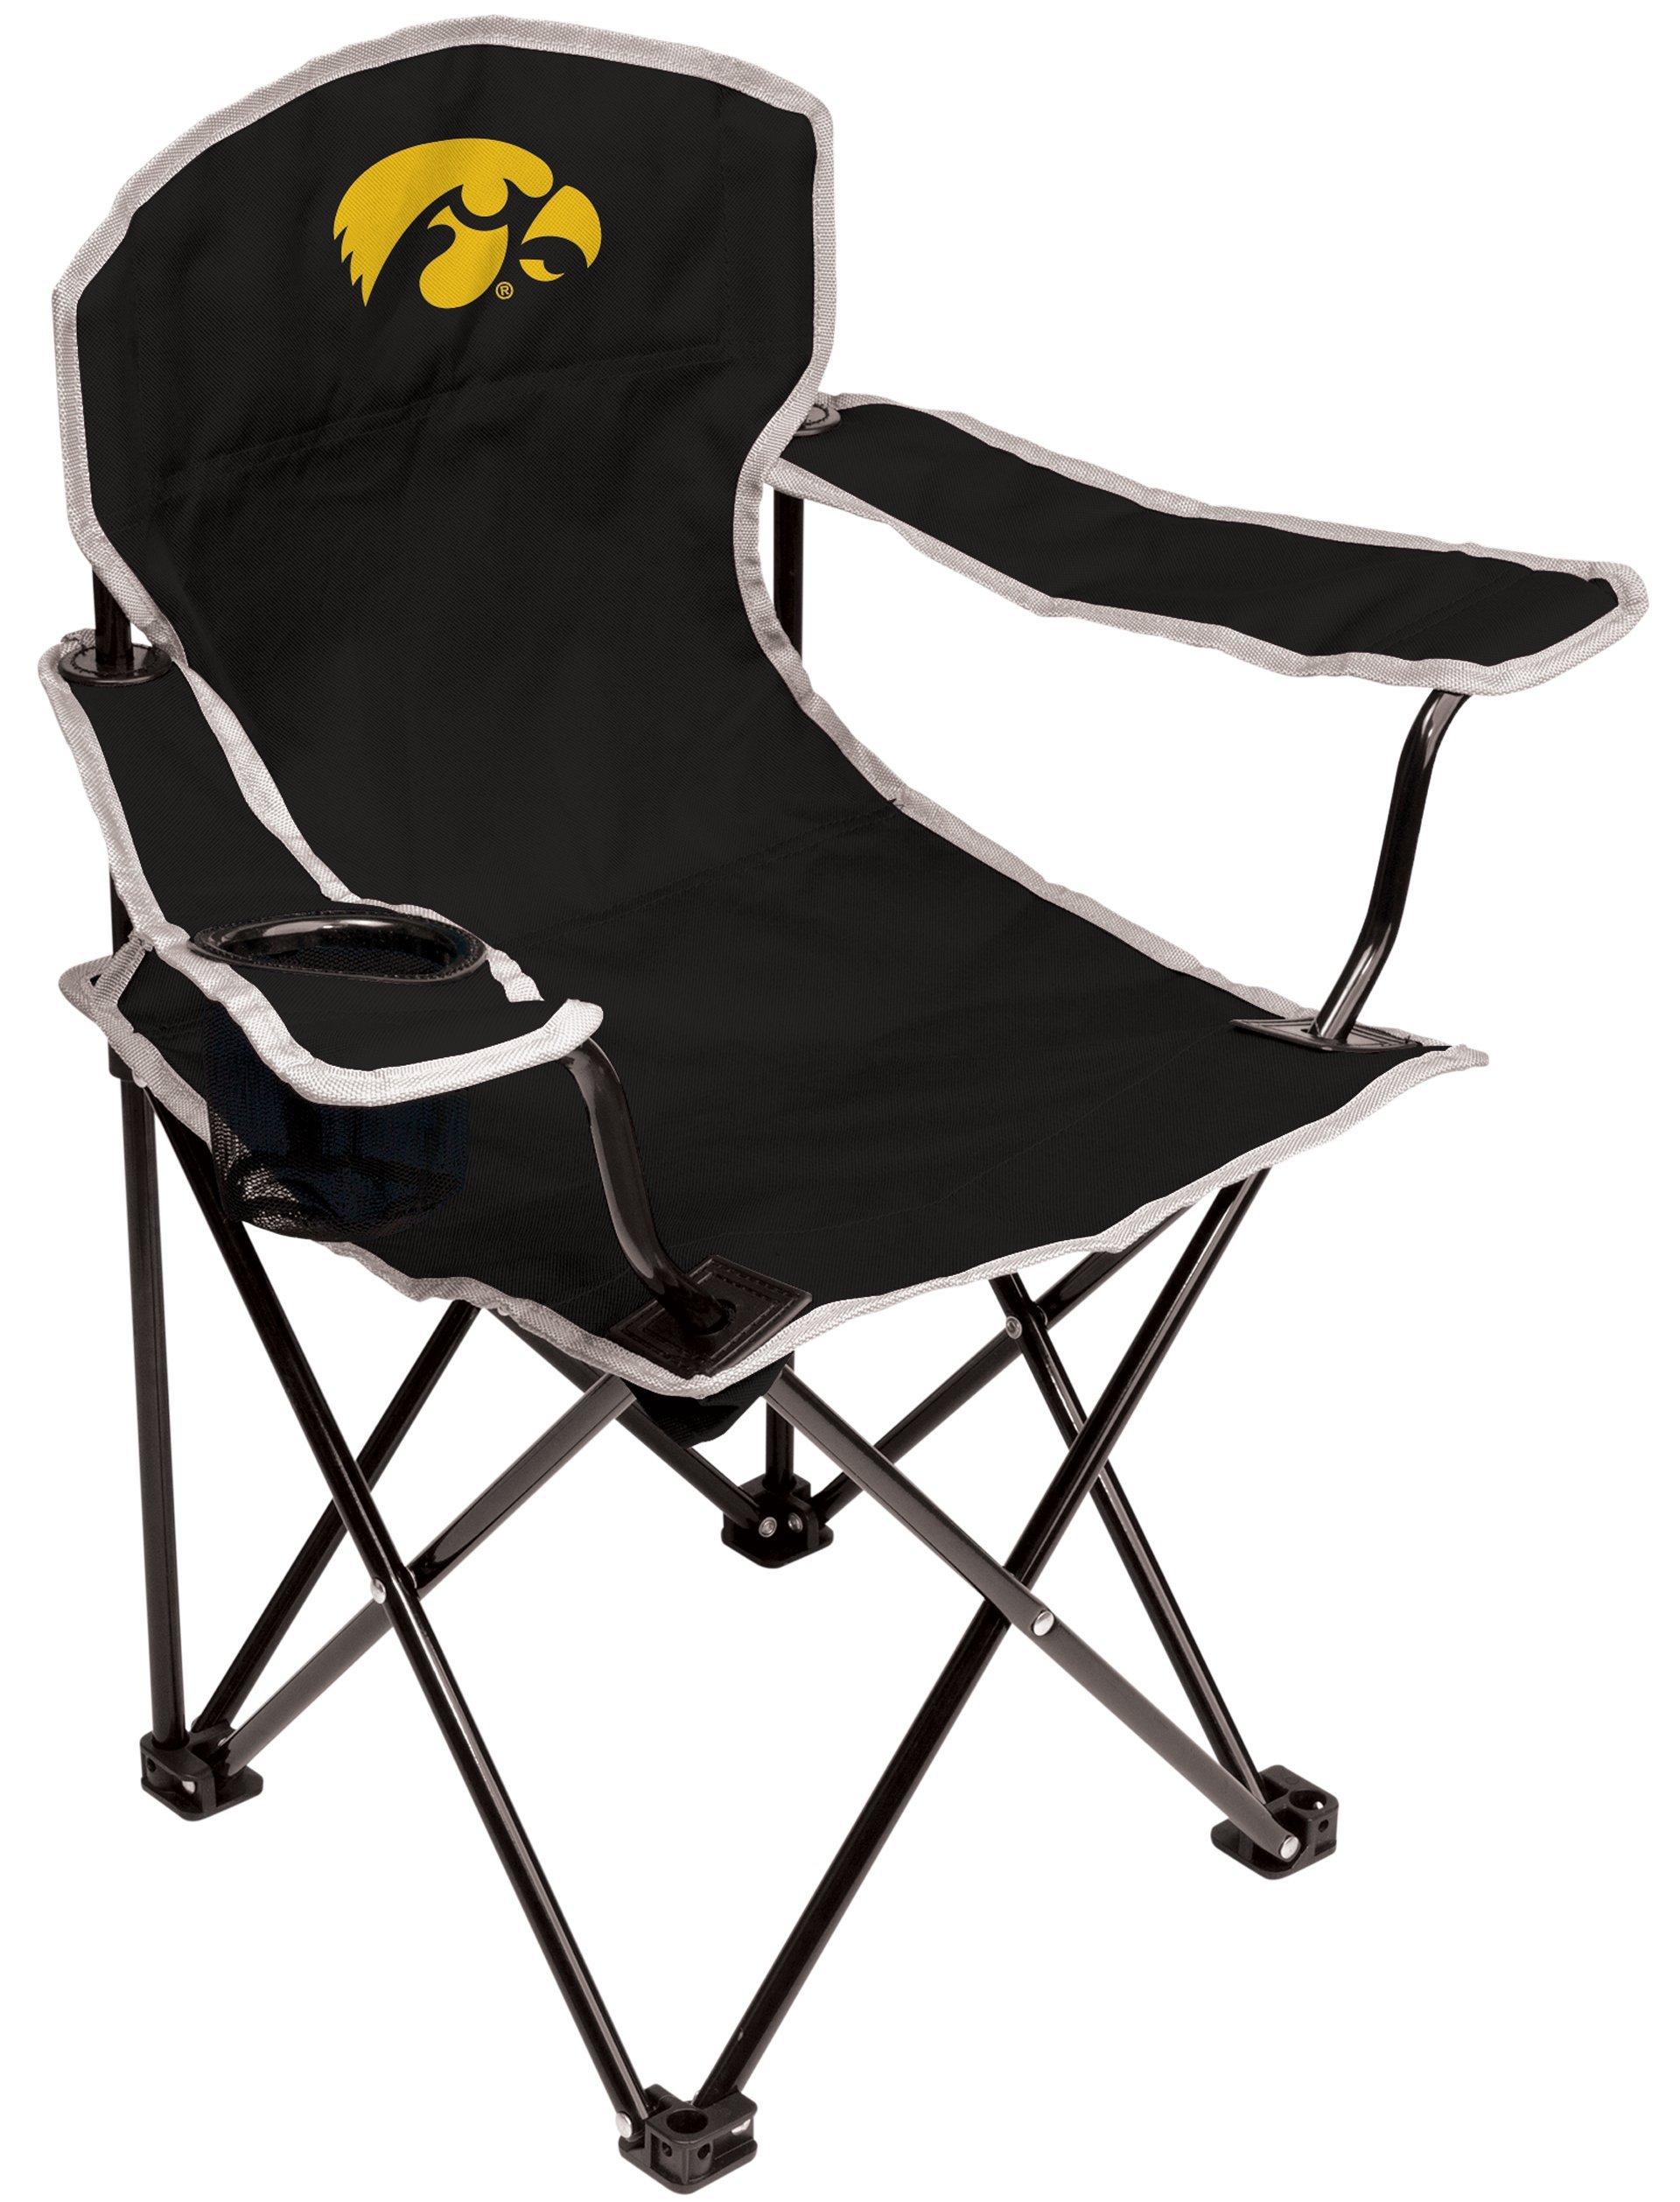 NCAA Iowa Hawkeyes Youth Folding Chair, Black